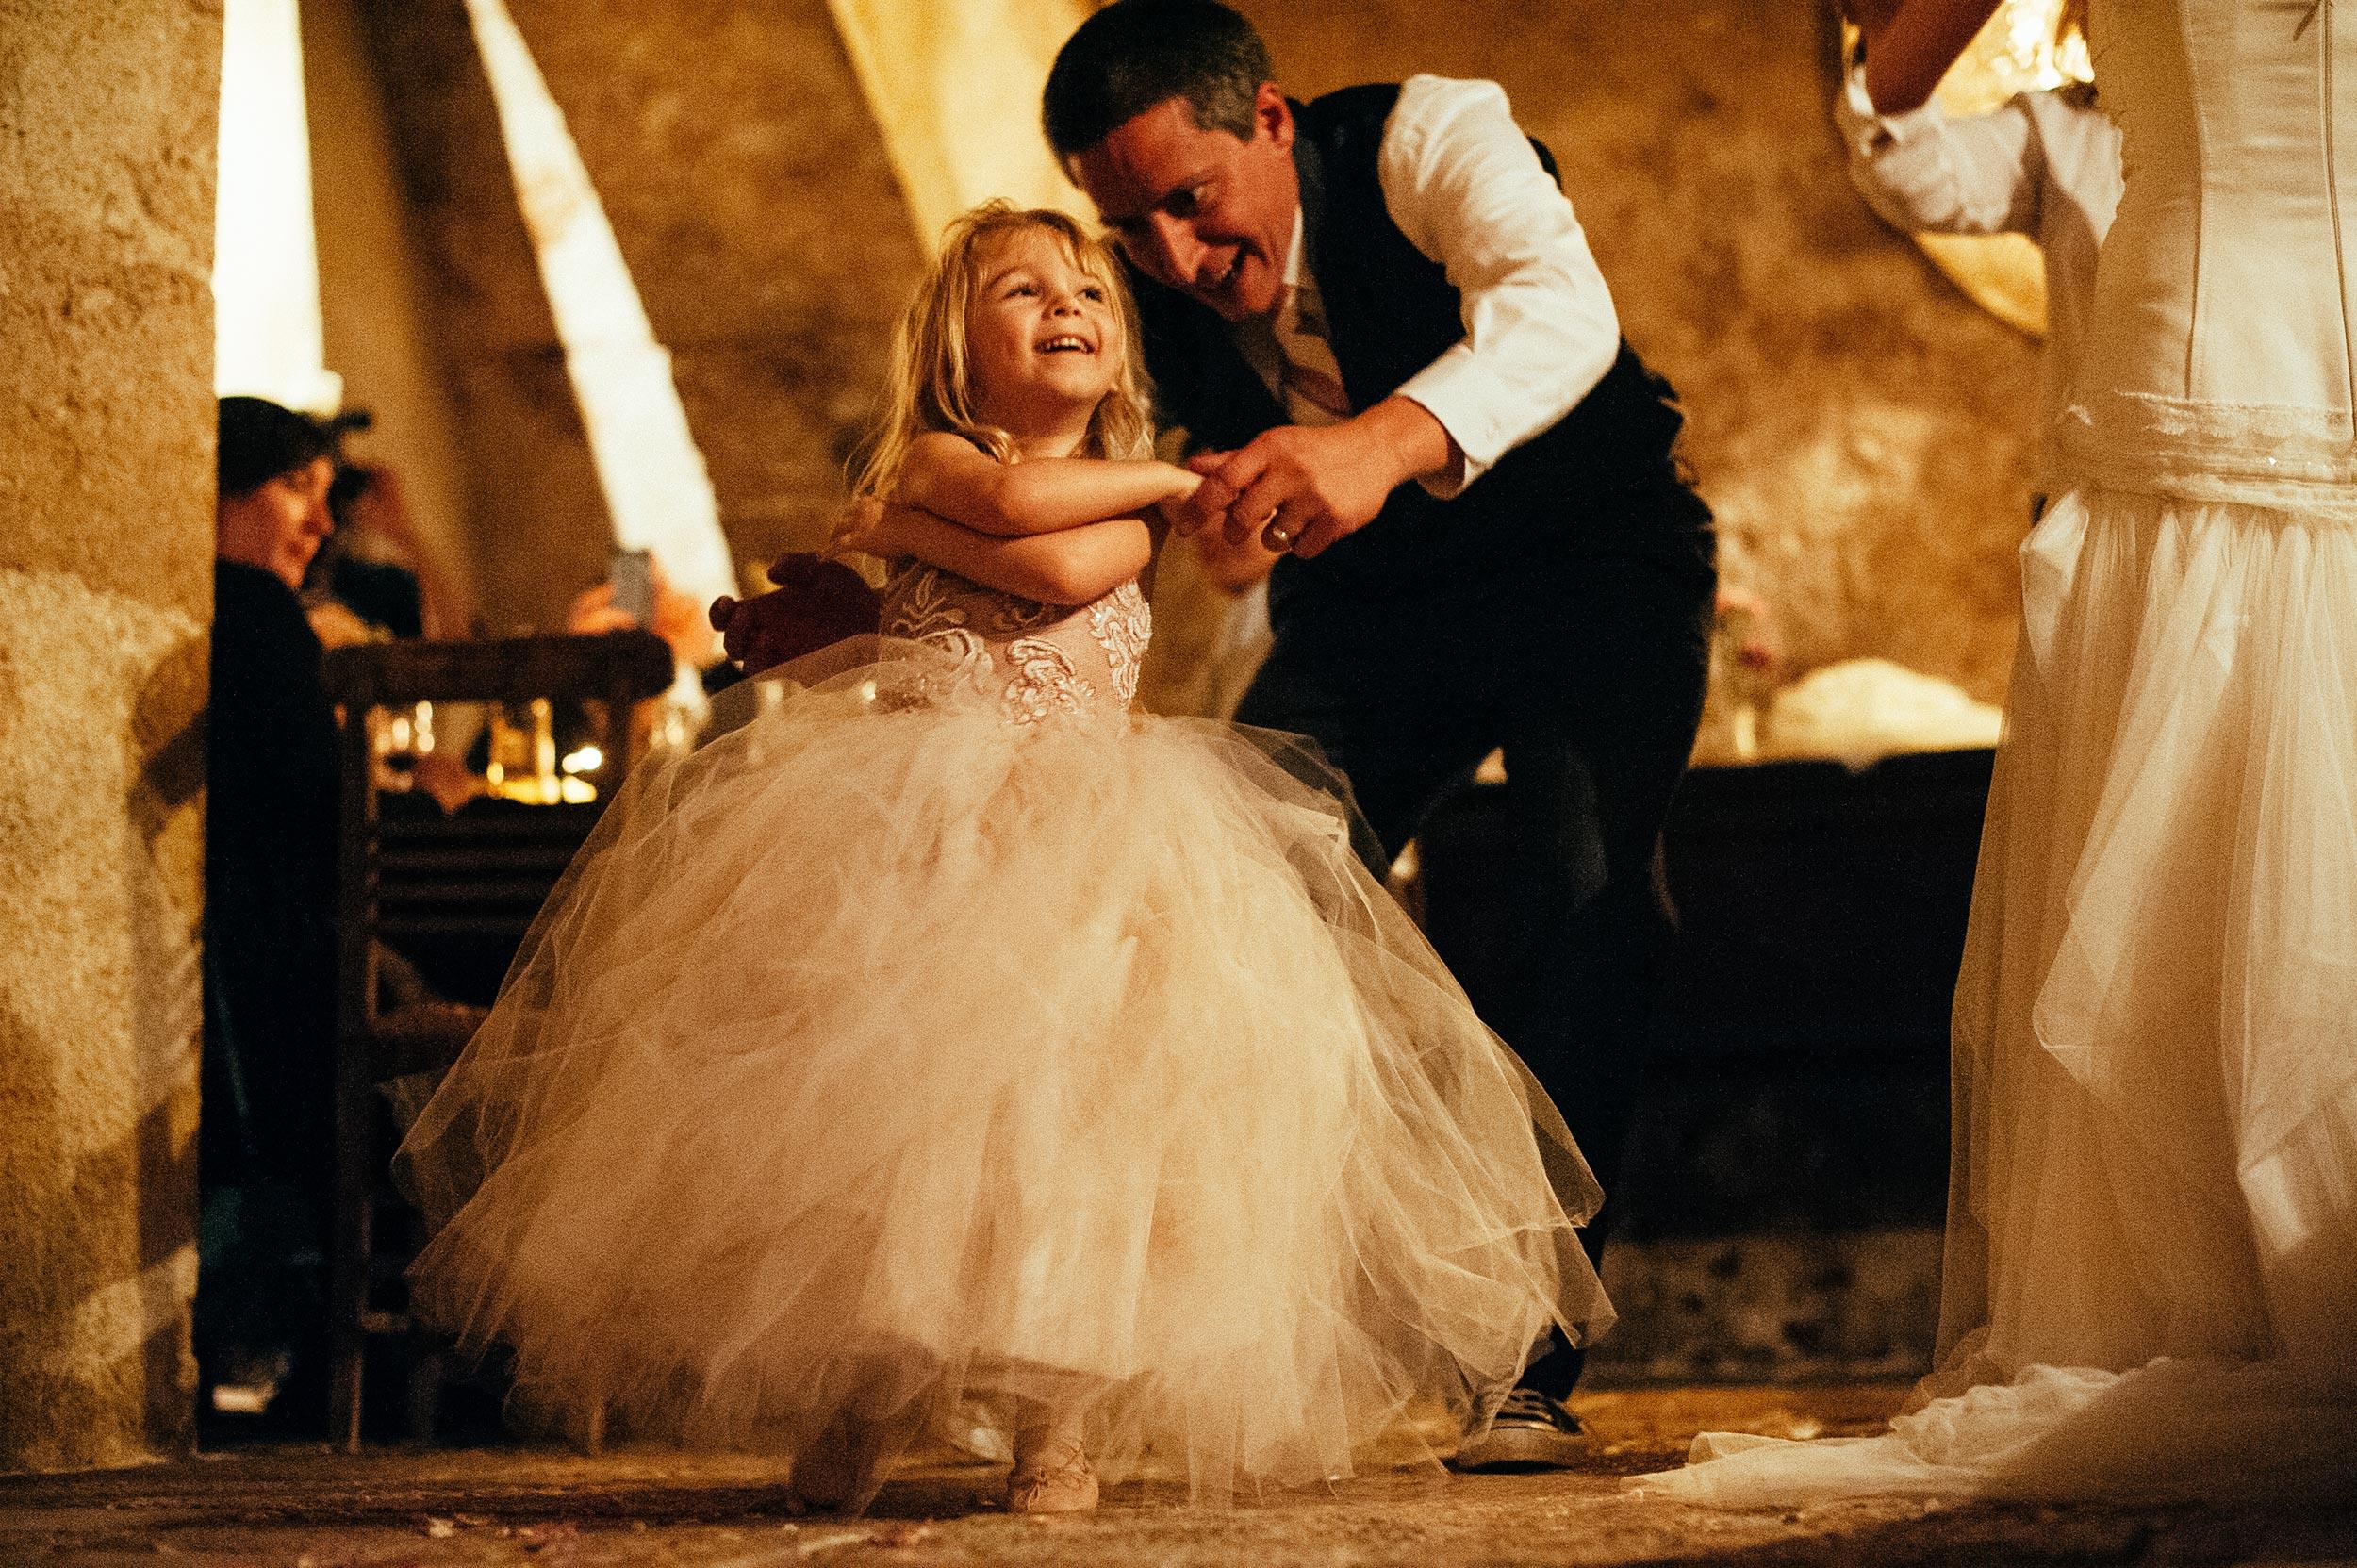 2014-Shelby-Jocelyn-Santo-Stefano-Di-Sessanio-Wedding-Photographer-Italy-Alessandro-Avenali-42.jpg